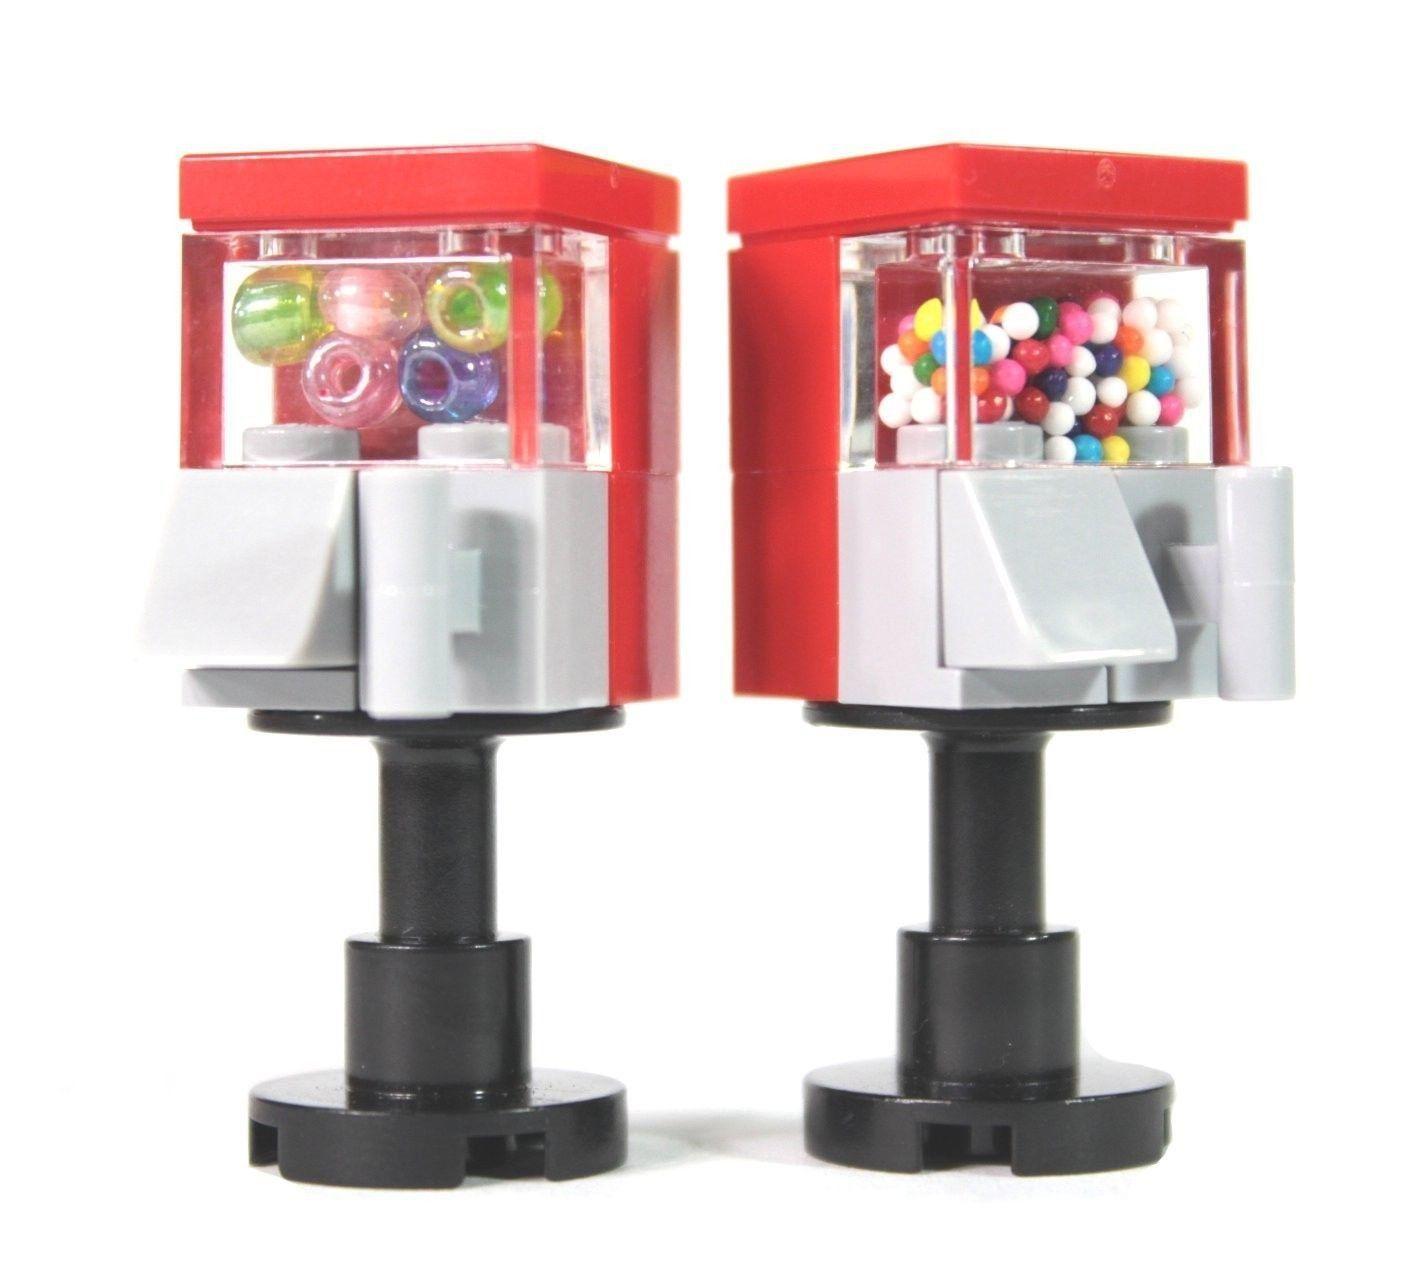 Lego Gumball Machines Fun Lego Builds Pinterest Gumball